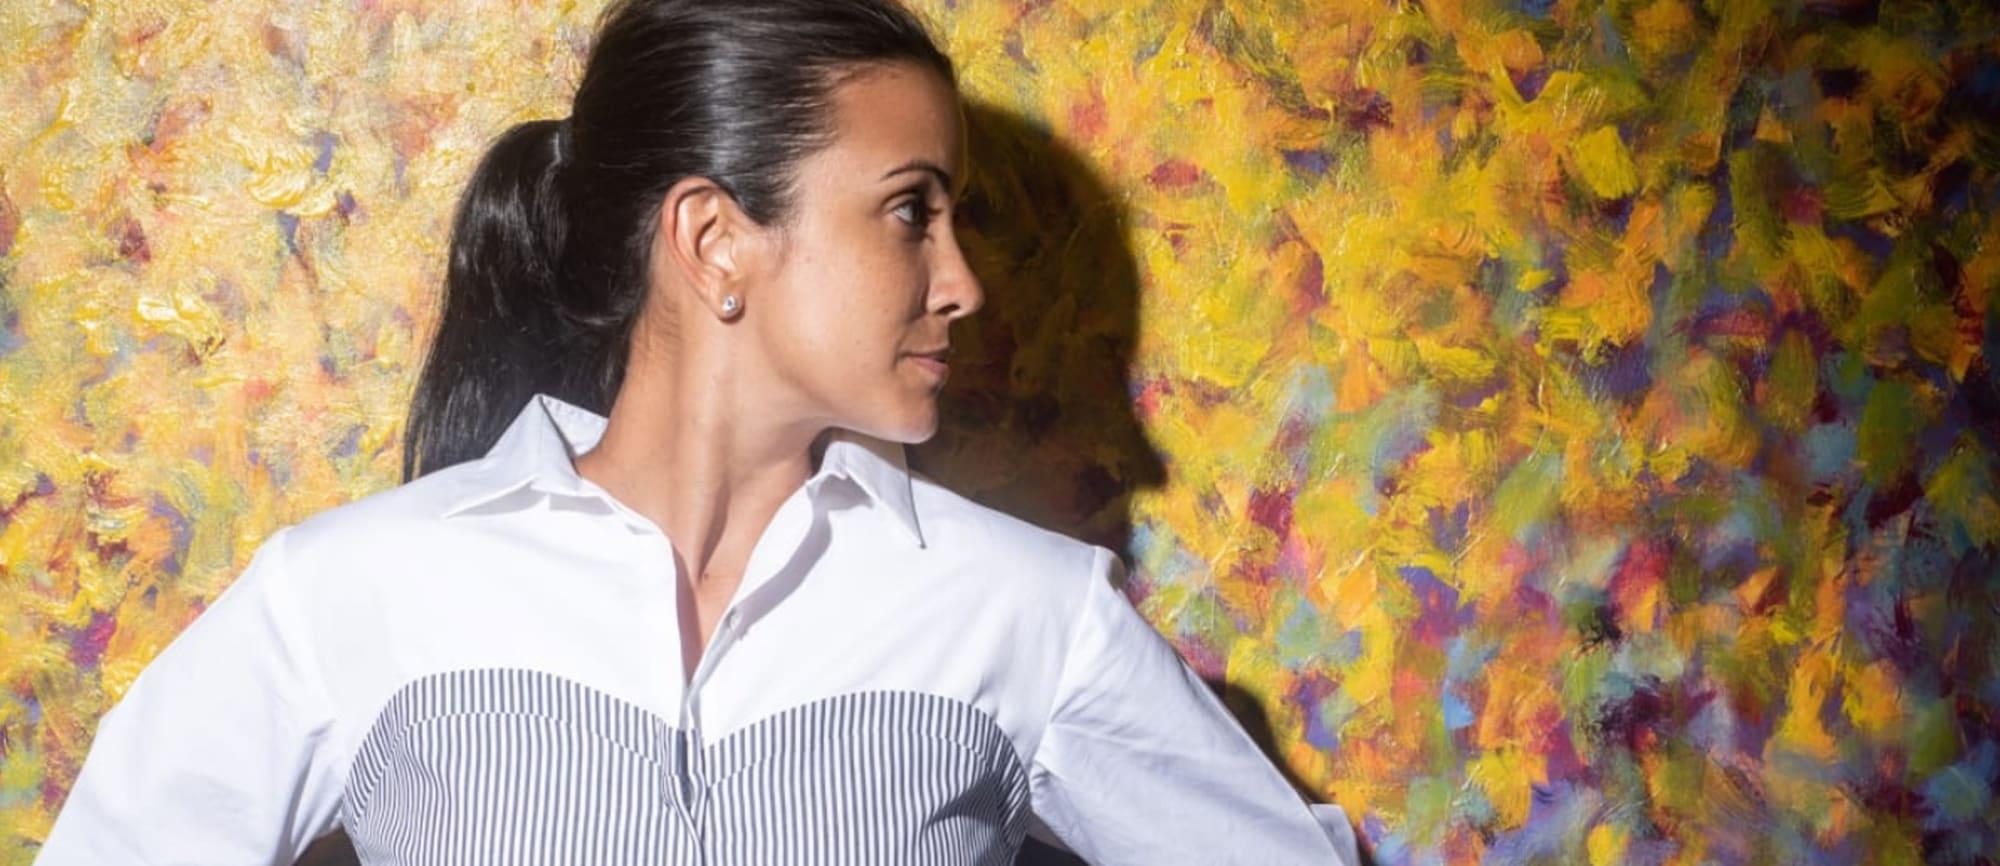 COLLECTOR PROFILE: ANNIKA FERNANDO